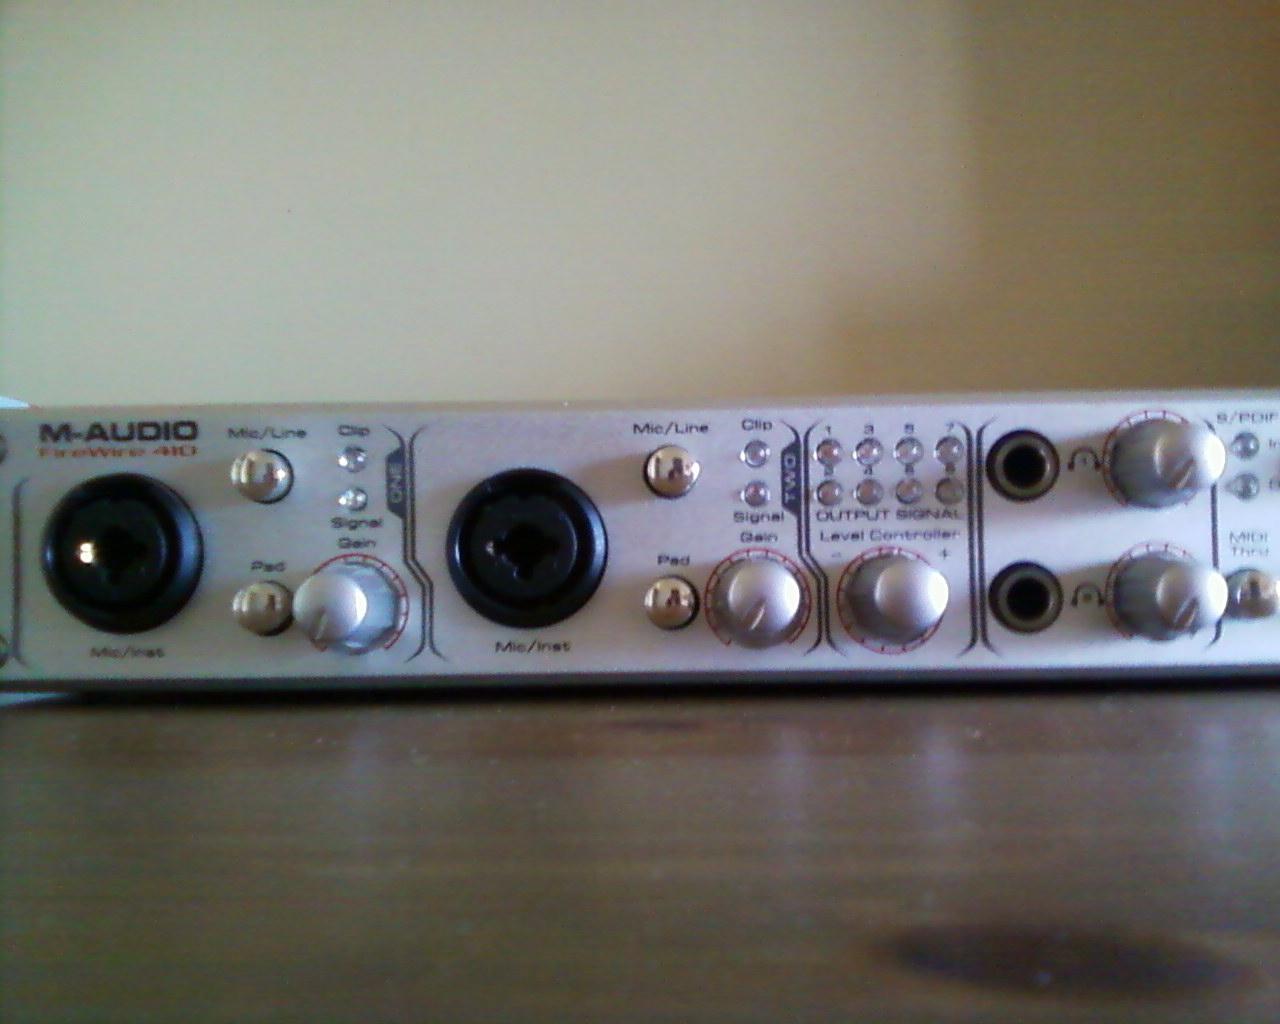 m-audio firewire 410 windows 8 driver